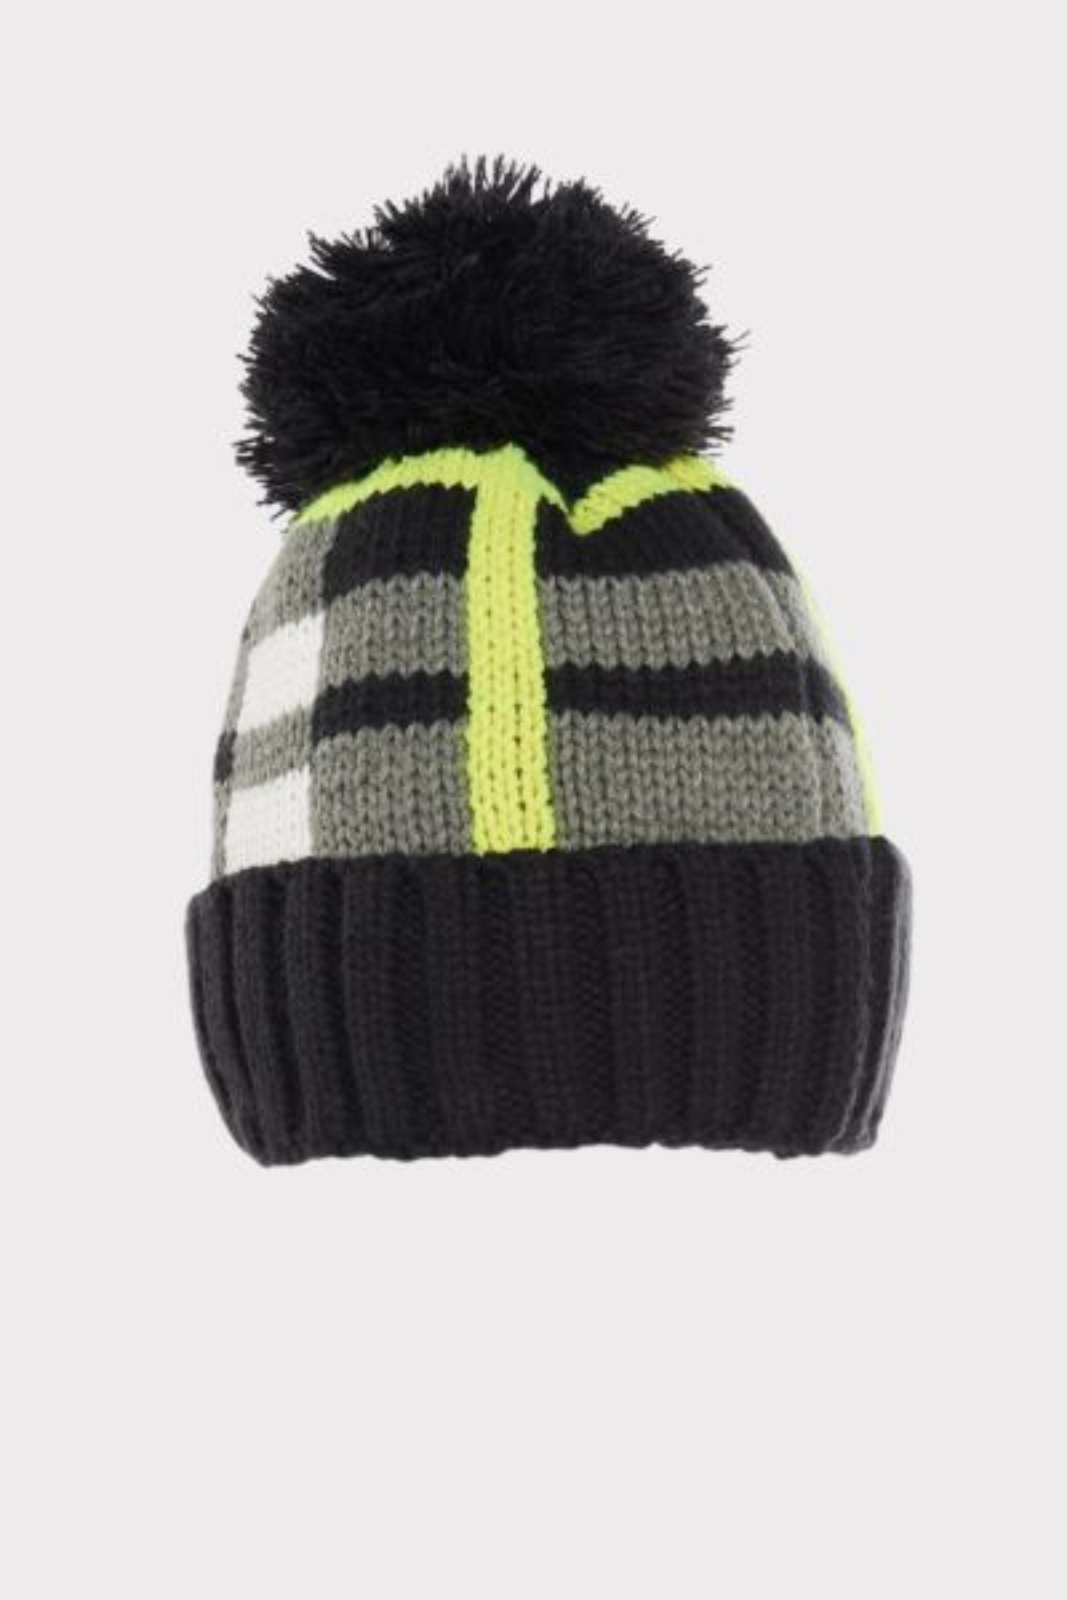 Harriet isles Plaid Hat